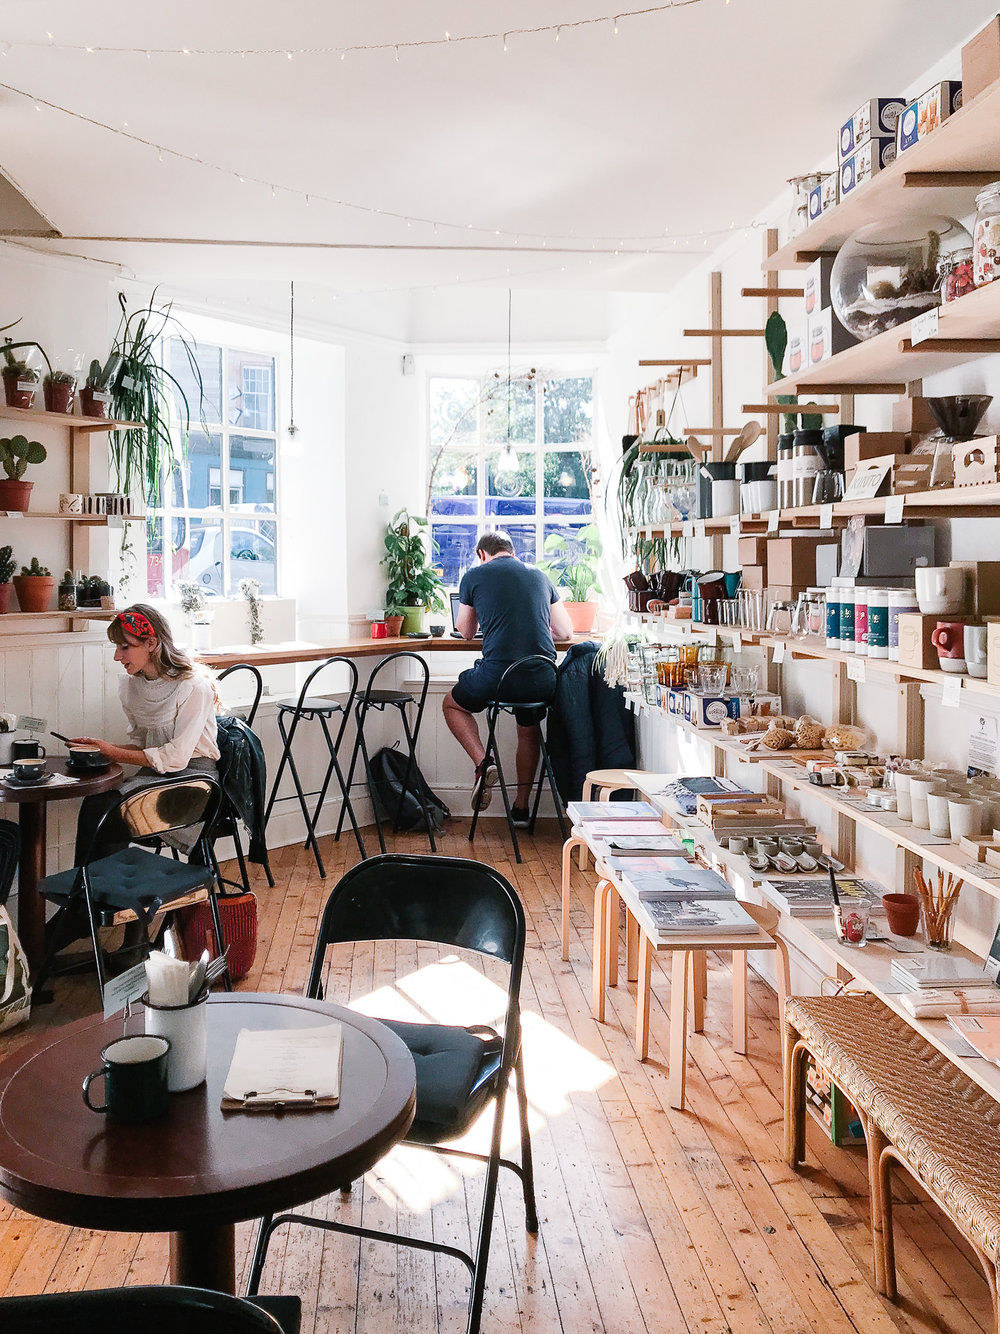 Century General Store cafe interior